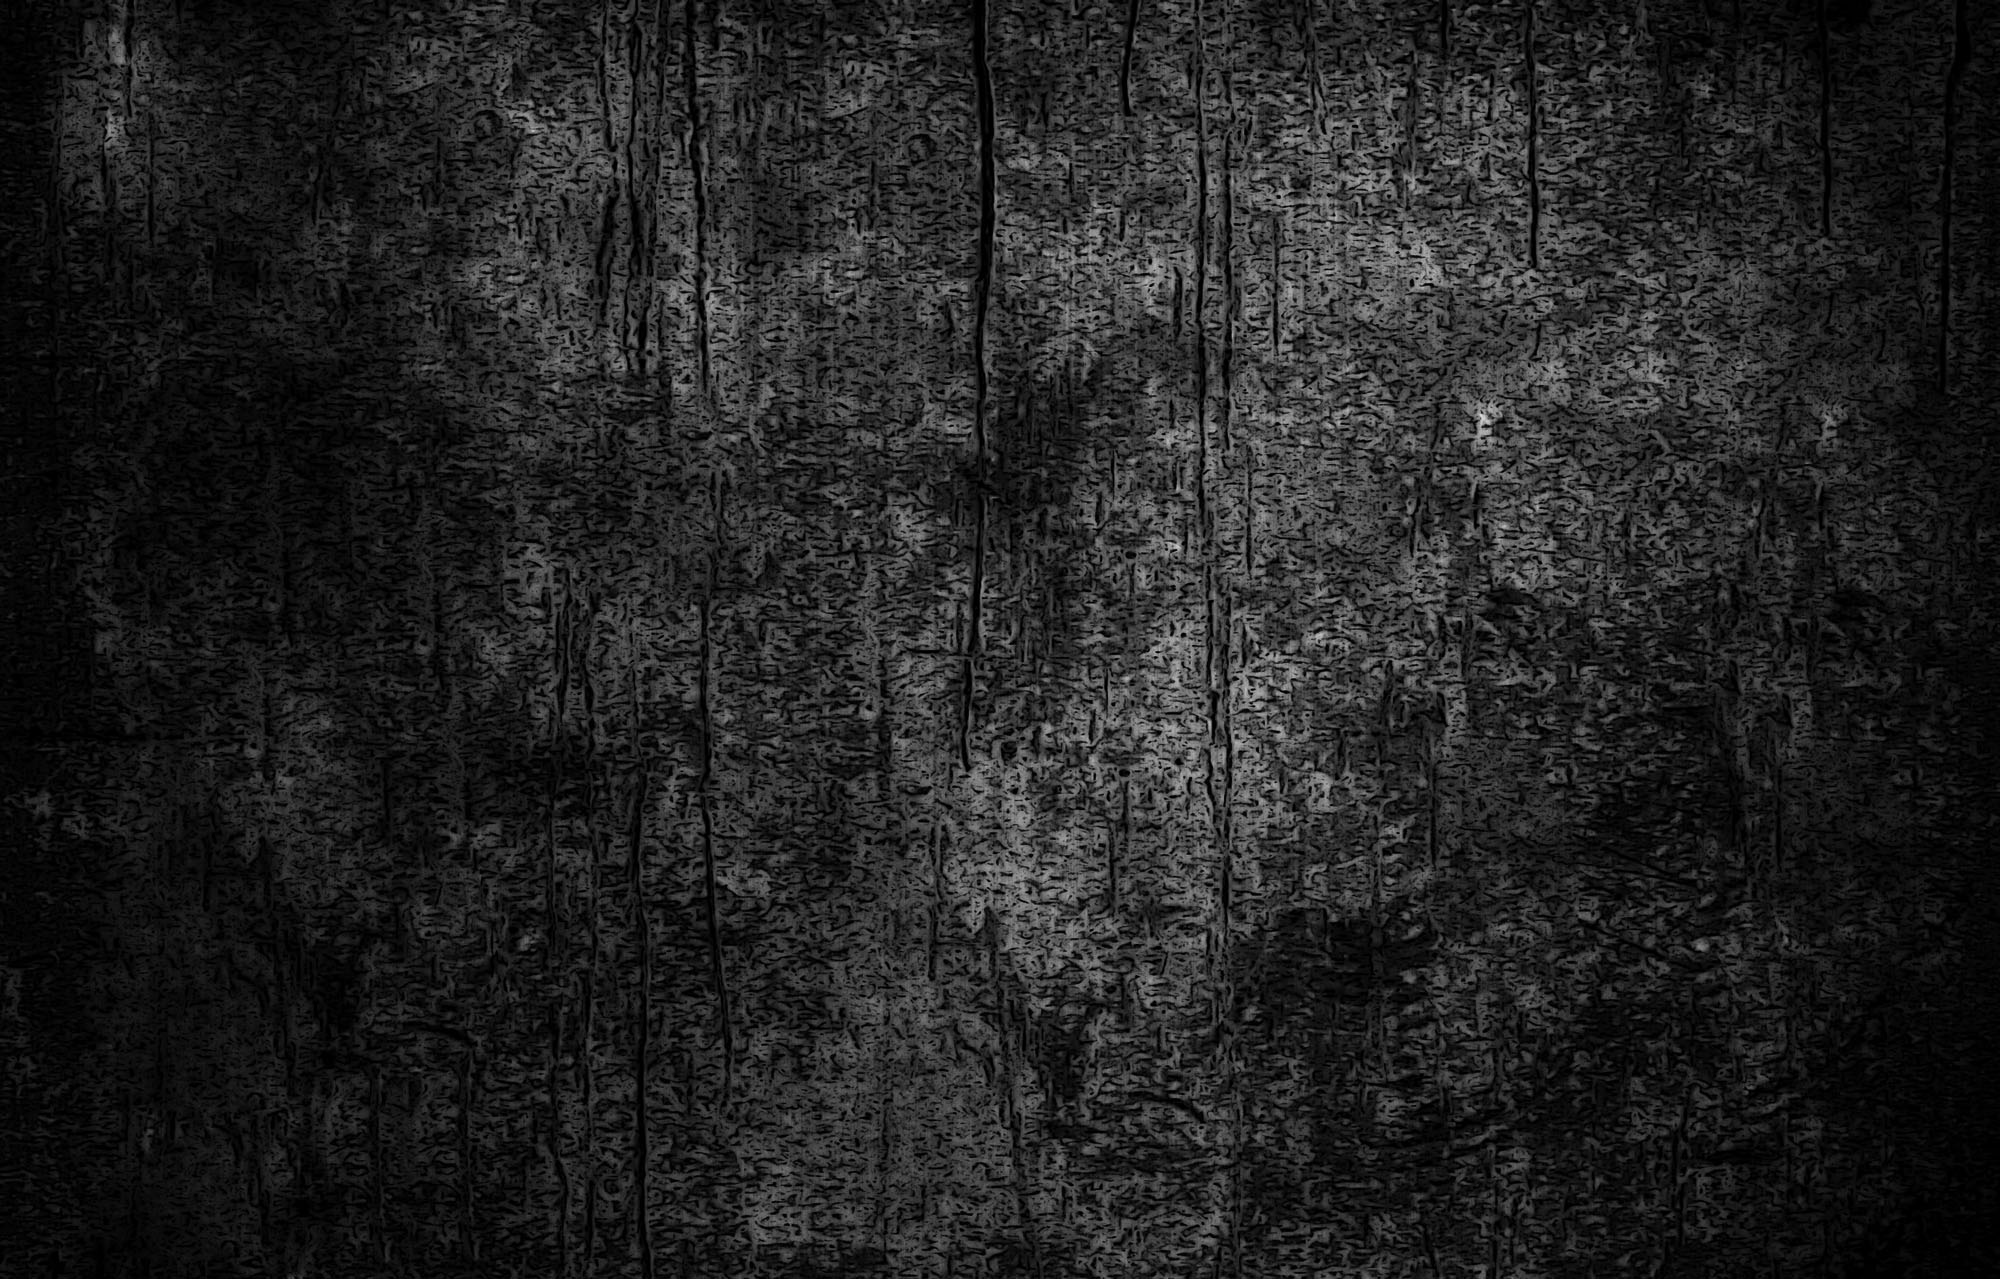 Hard Grunge Background Tumblr image gallery 2000x1279